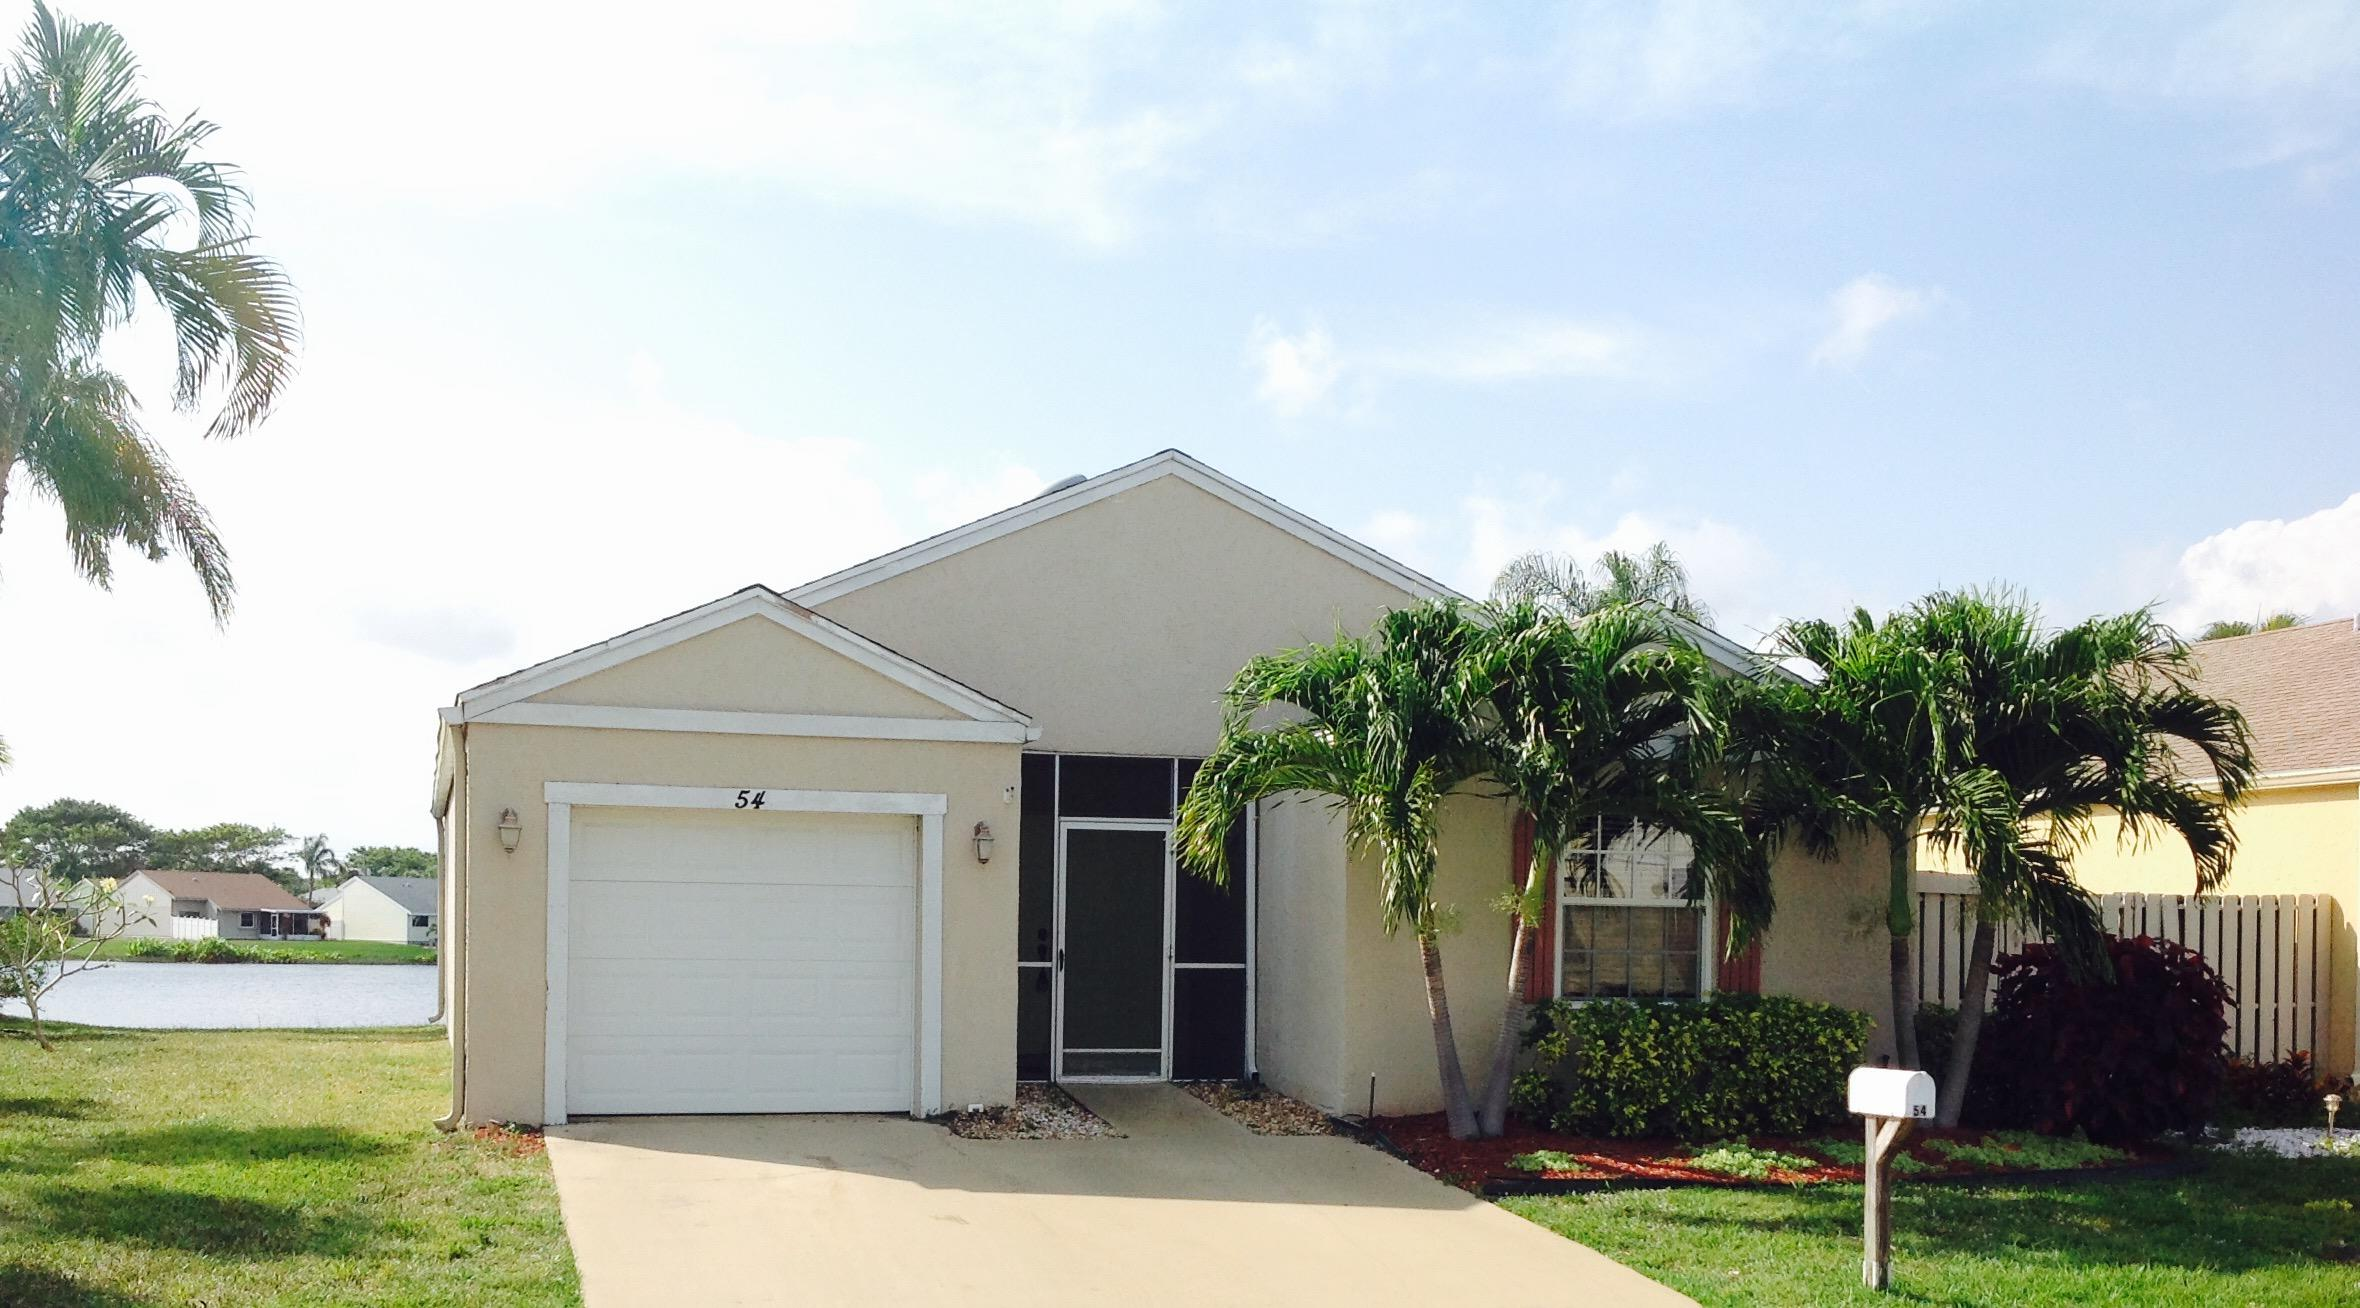 54 Buxton Lane Boynton Beach, FL 33426